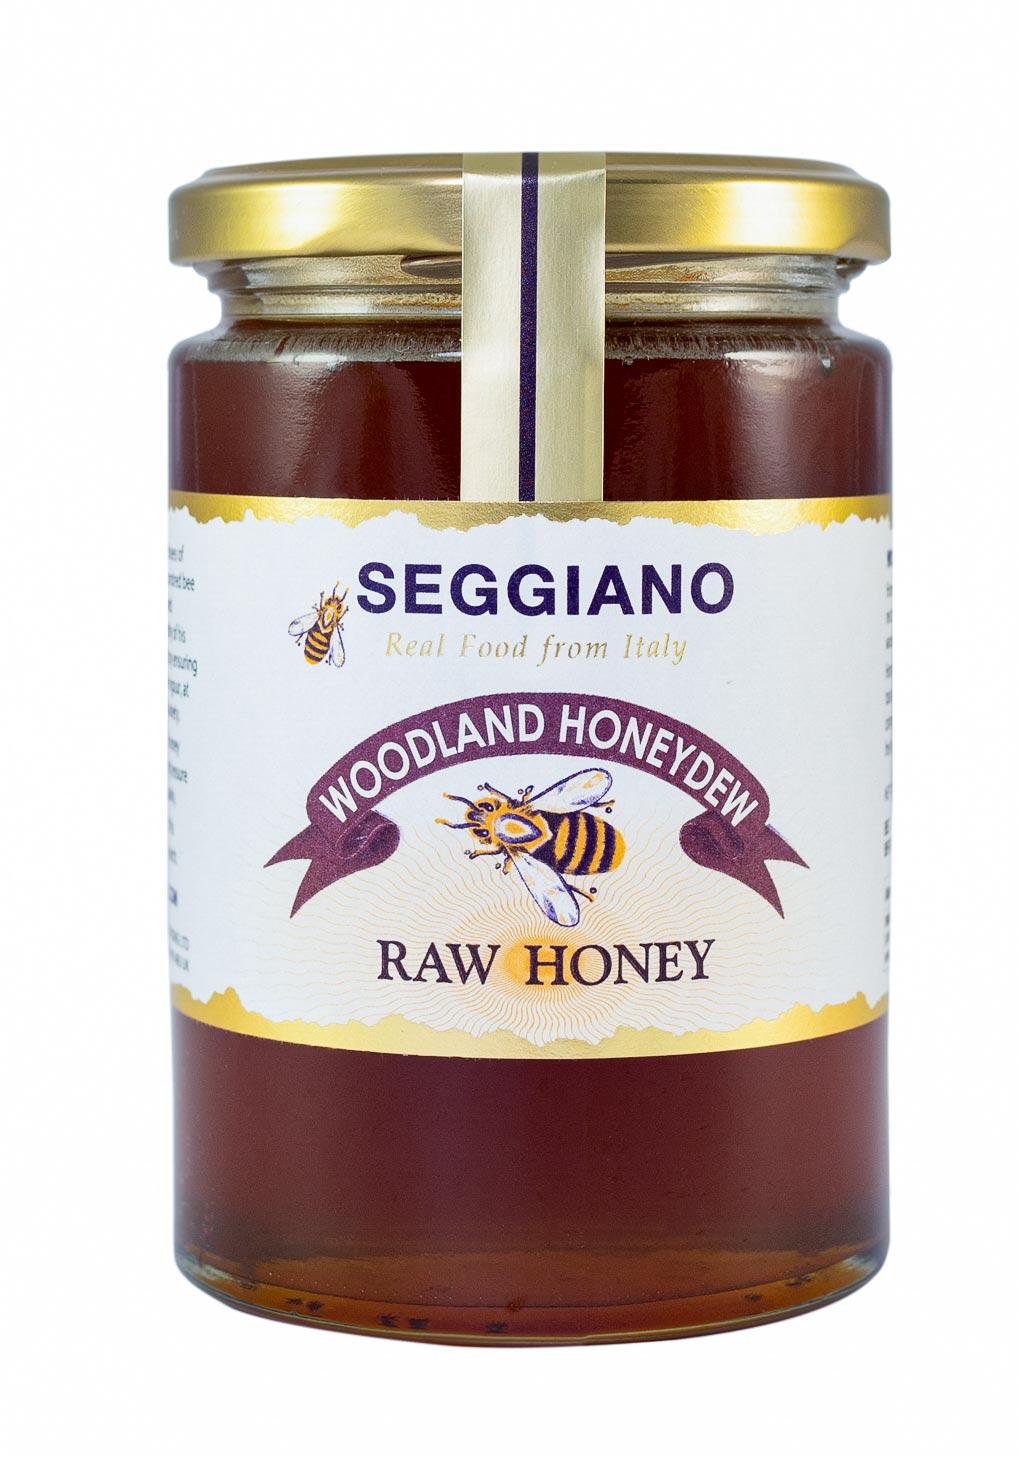 Seggiano Woodland Honeydew Raw Honey 500g